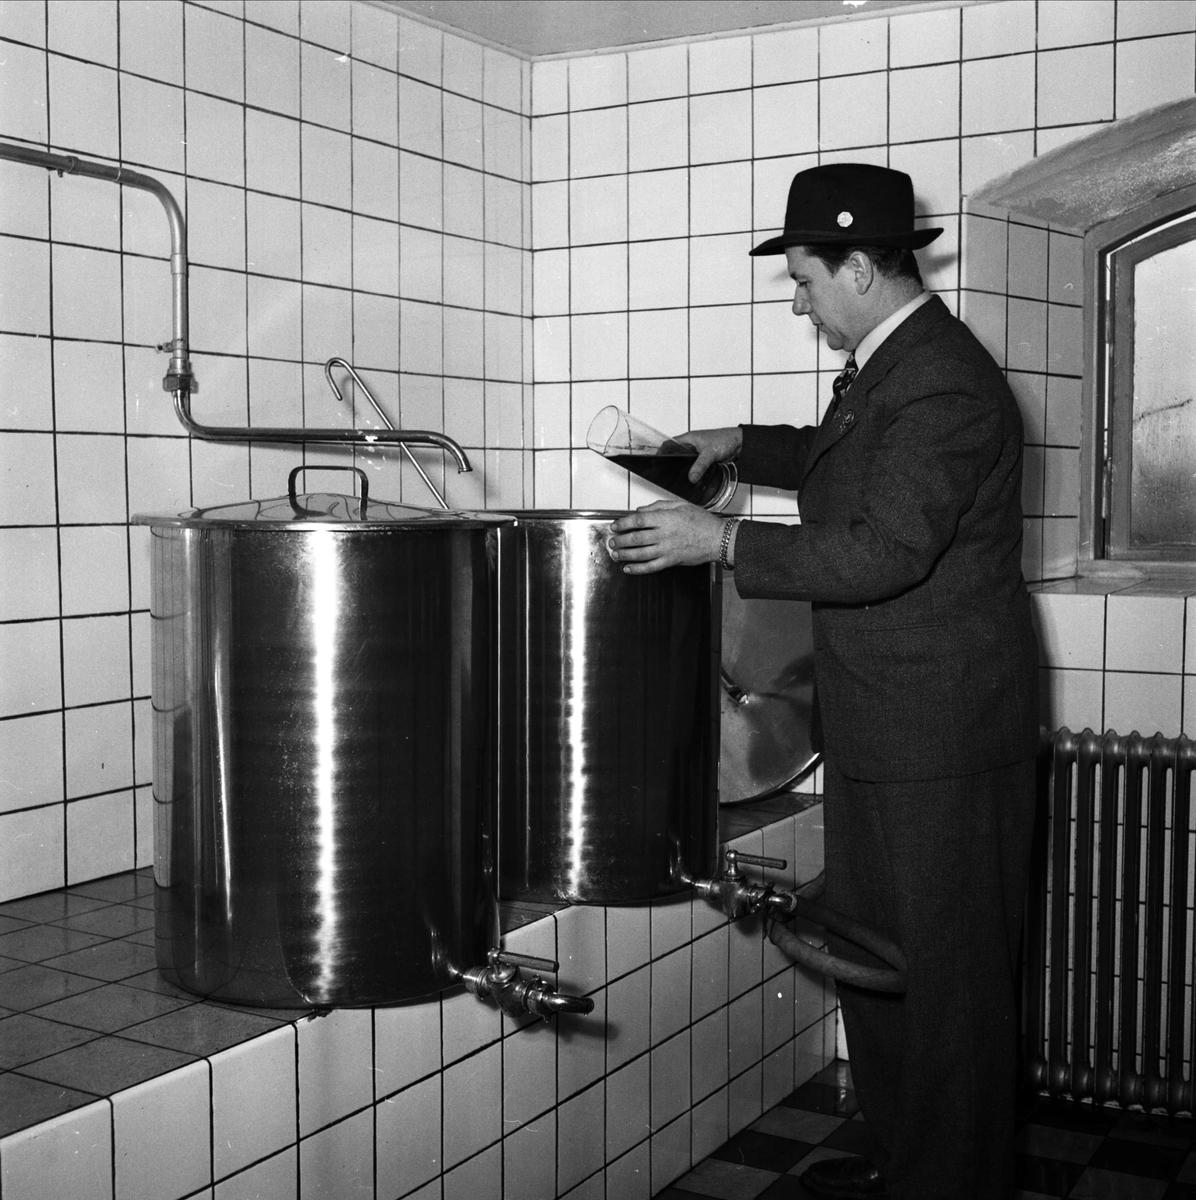 """Mejeri blev bryggeri"", Storvreta Bryggeri, Rasbo, Uppland 1951. Sannolikt ägaren Rune Andersson i laboratoriet"